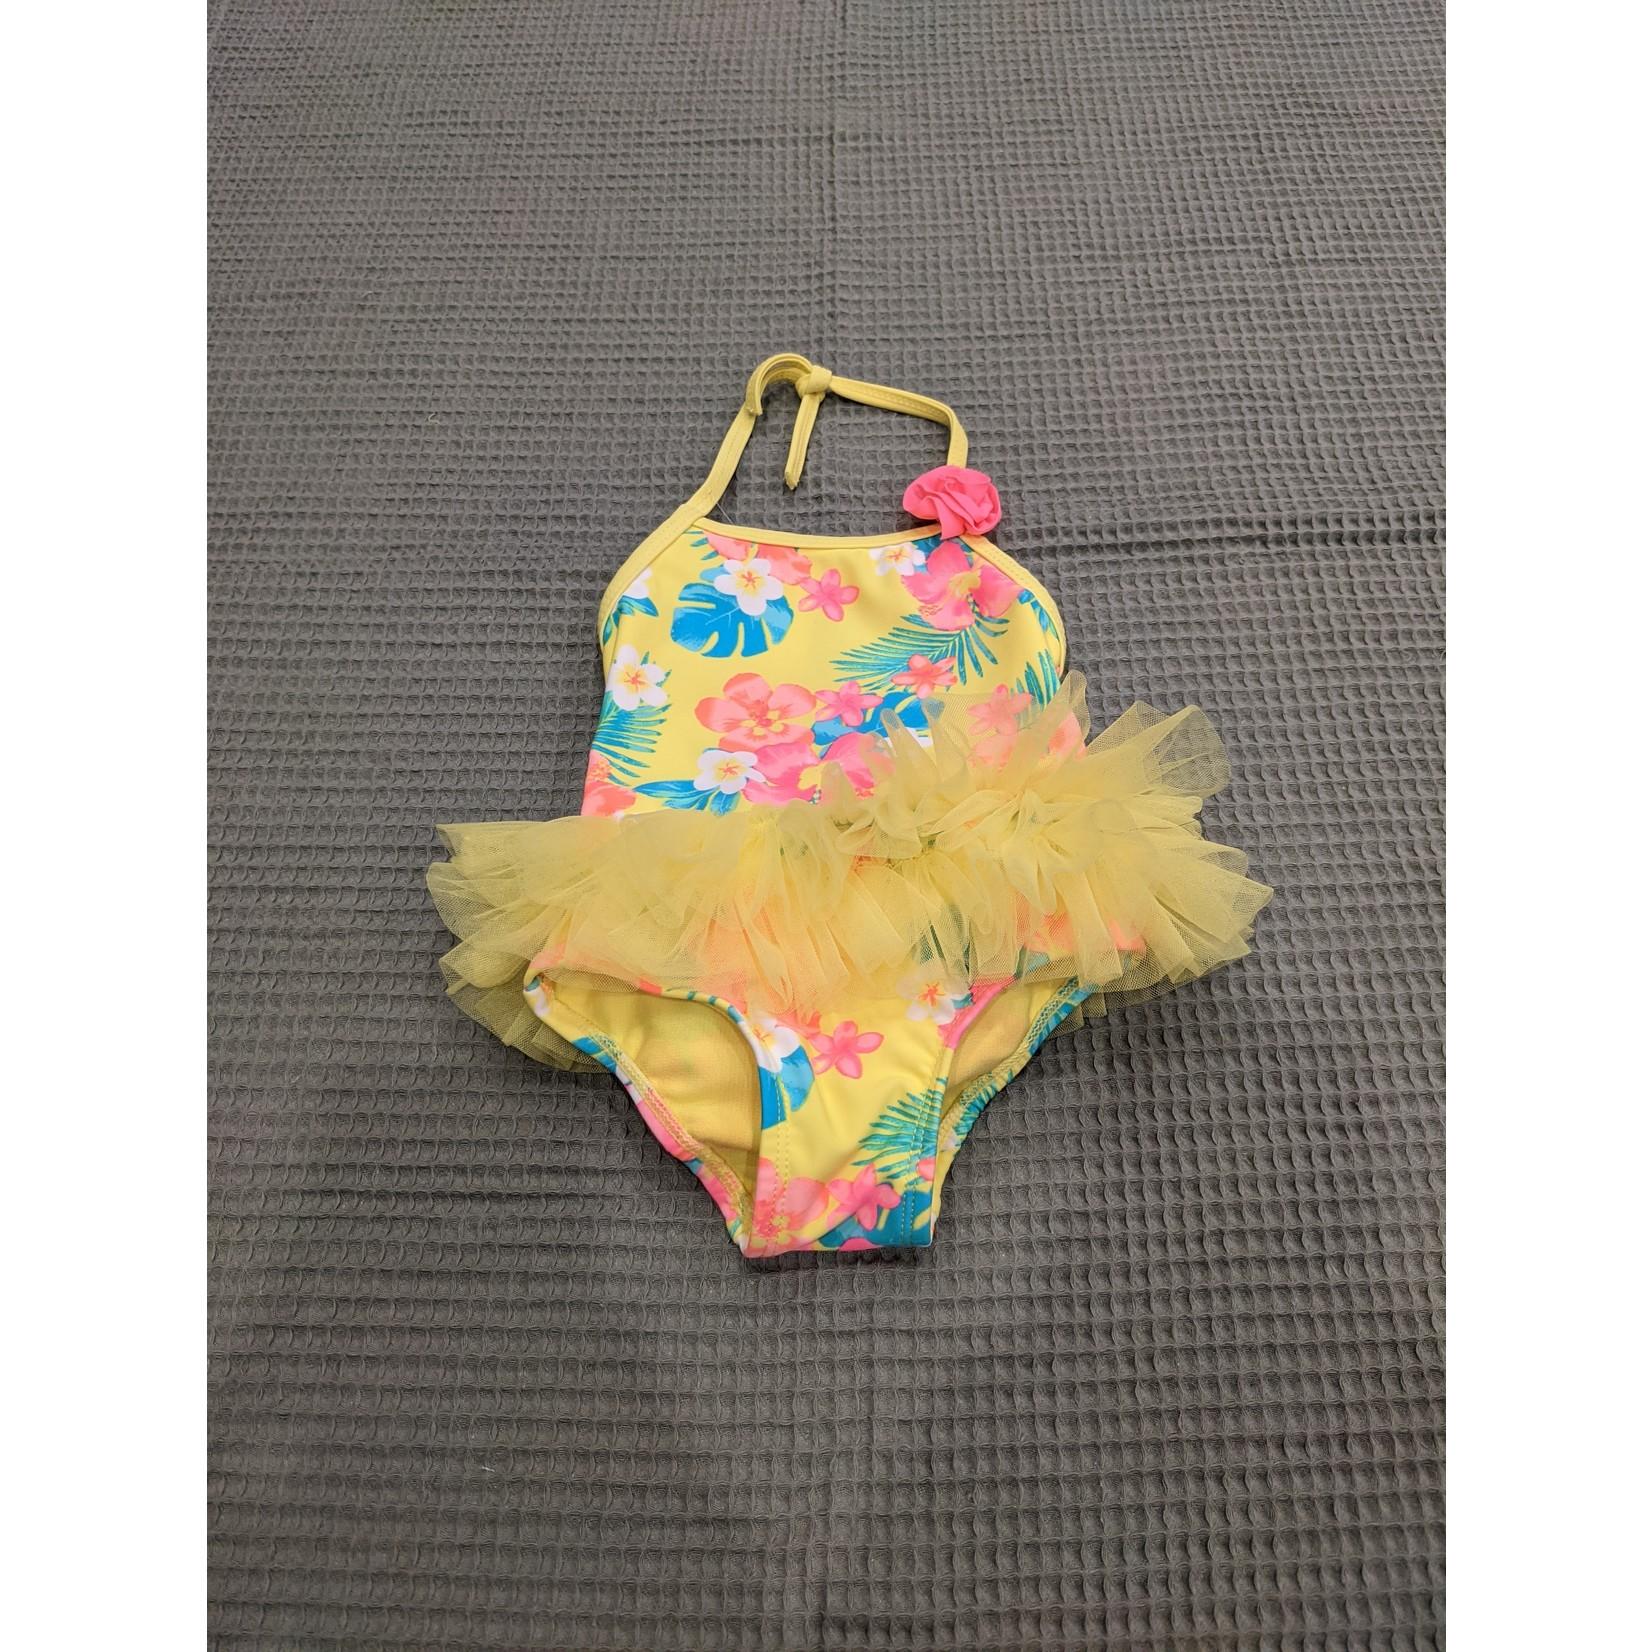 #89 Maillot jaune hawaïen